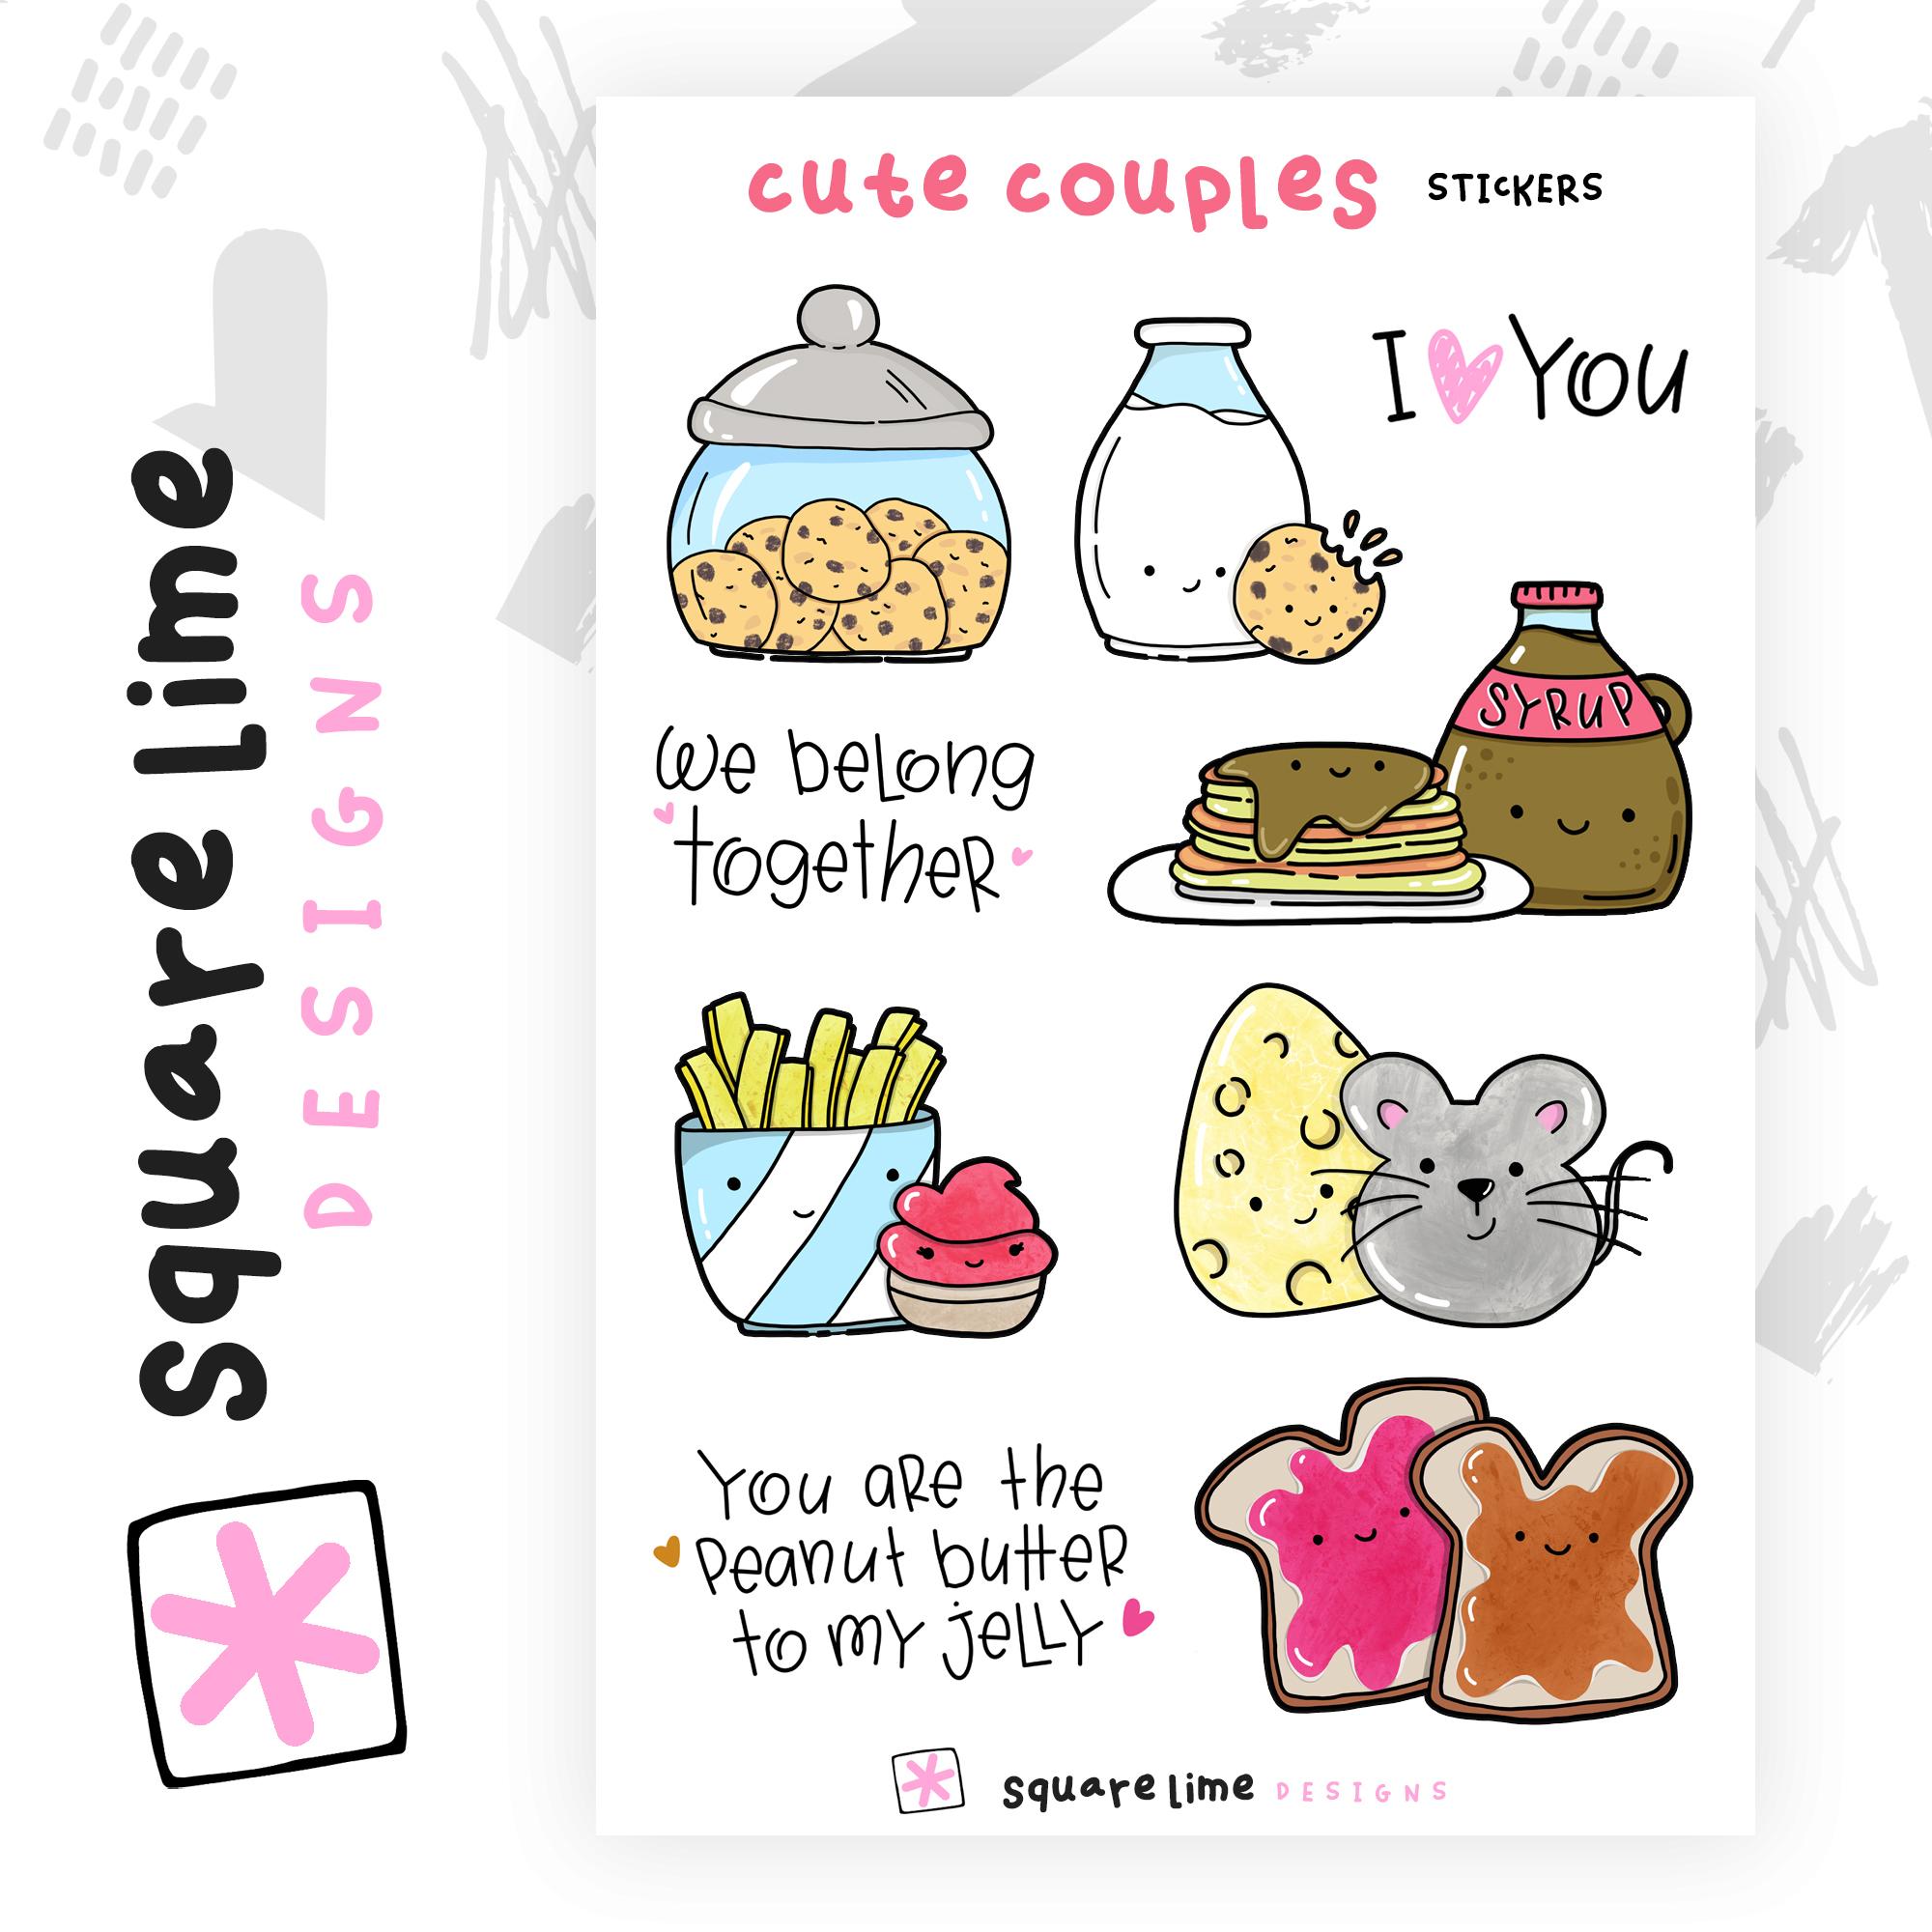 Cute Couples Stickers - June 2019 bullet journal setup - christina77star.net